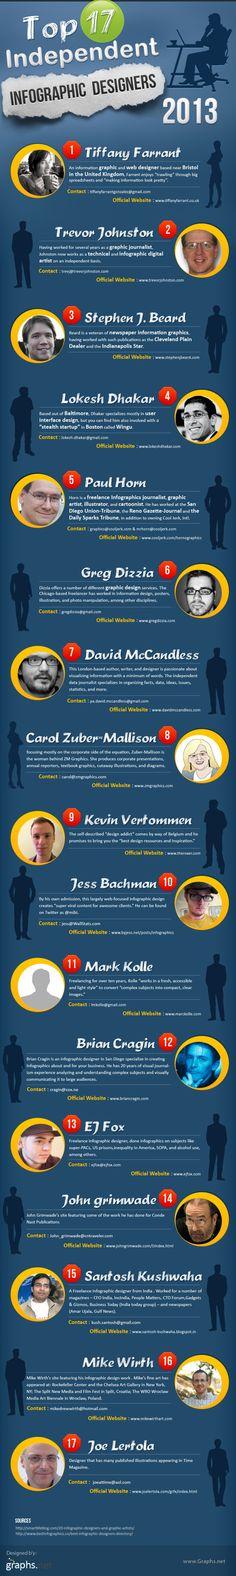 Top 17 infographic design companies #infografia #infographic ...